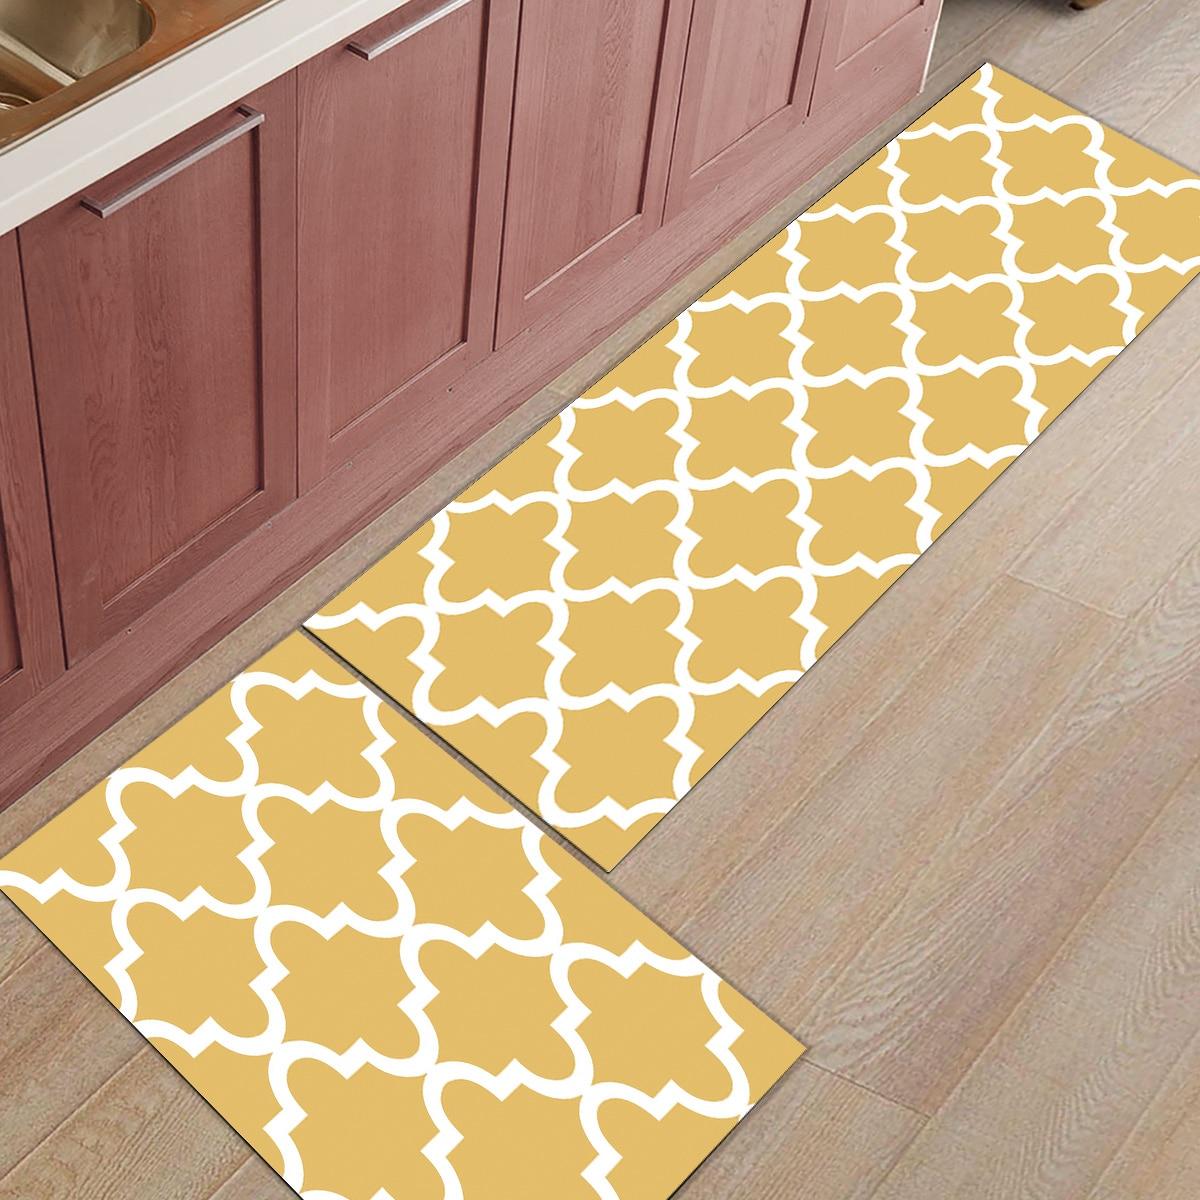 9Pcs/Set Geometric Lattice Moroccan Yellow Kitchen Mat Modern Carpet  Entrance Doormat Tapete Rugs Bedroom Mats Home Decor